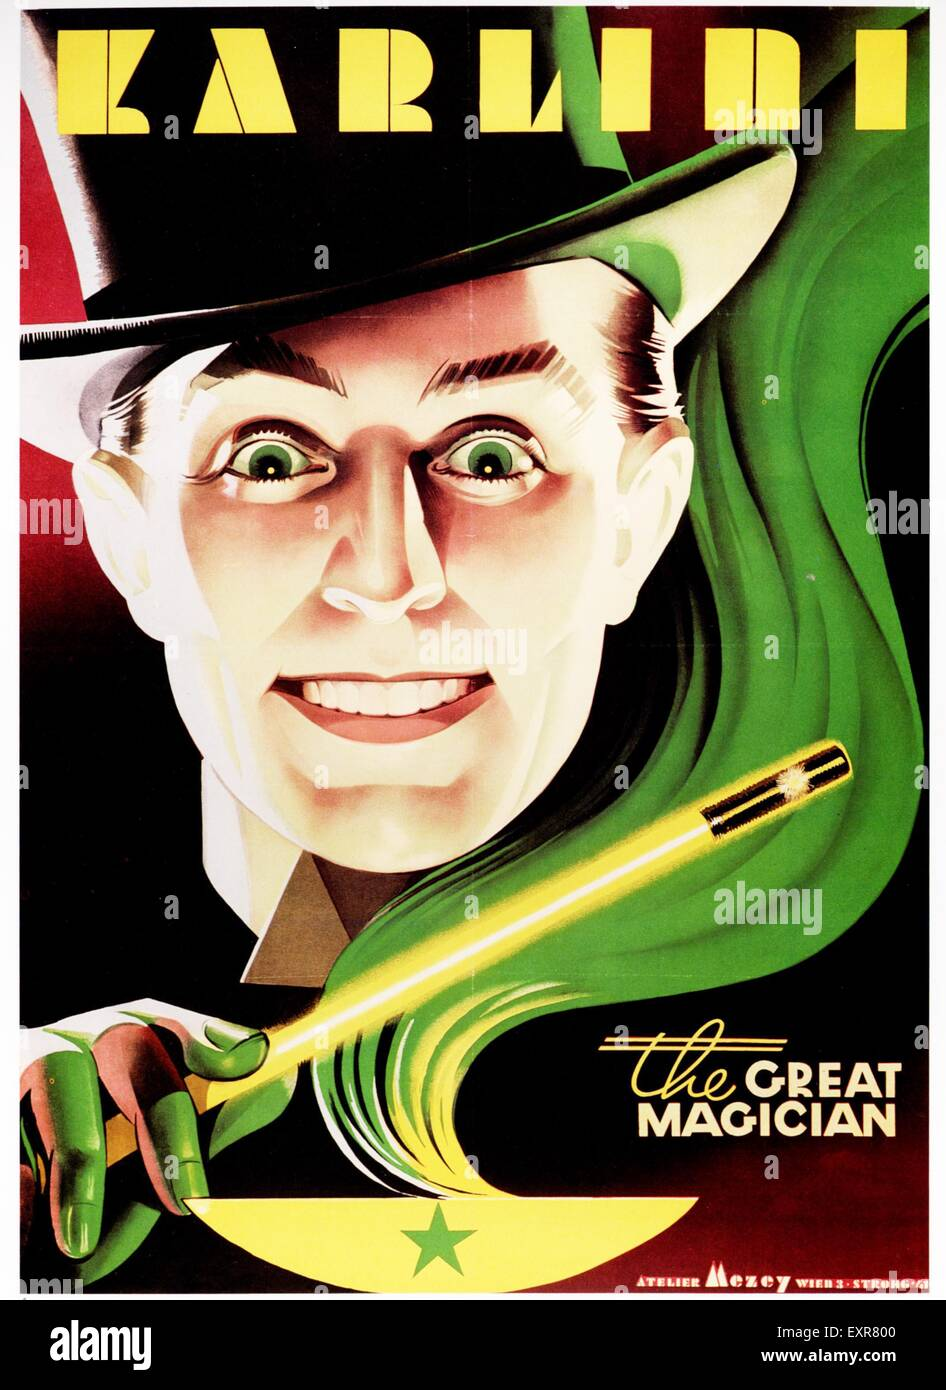 1930s USA Karlini The Magician Poster - Stock Image